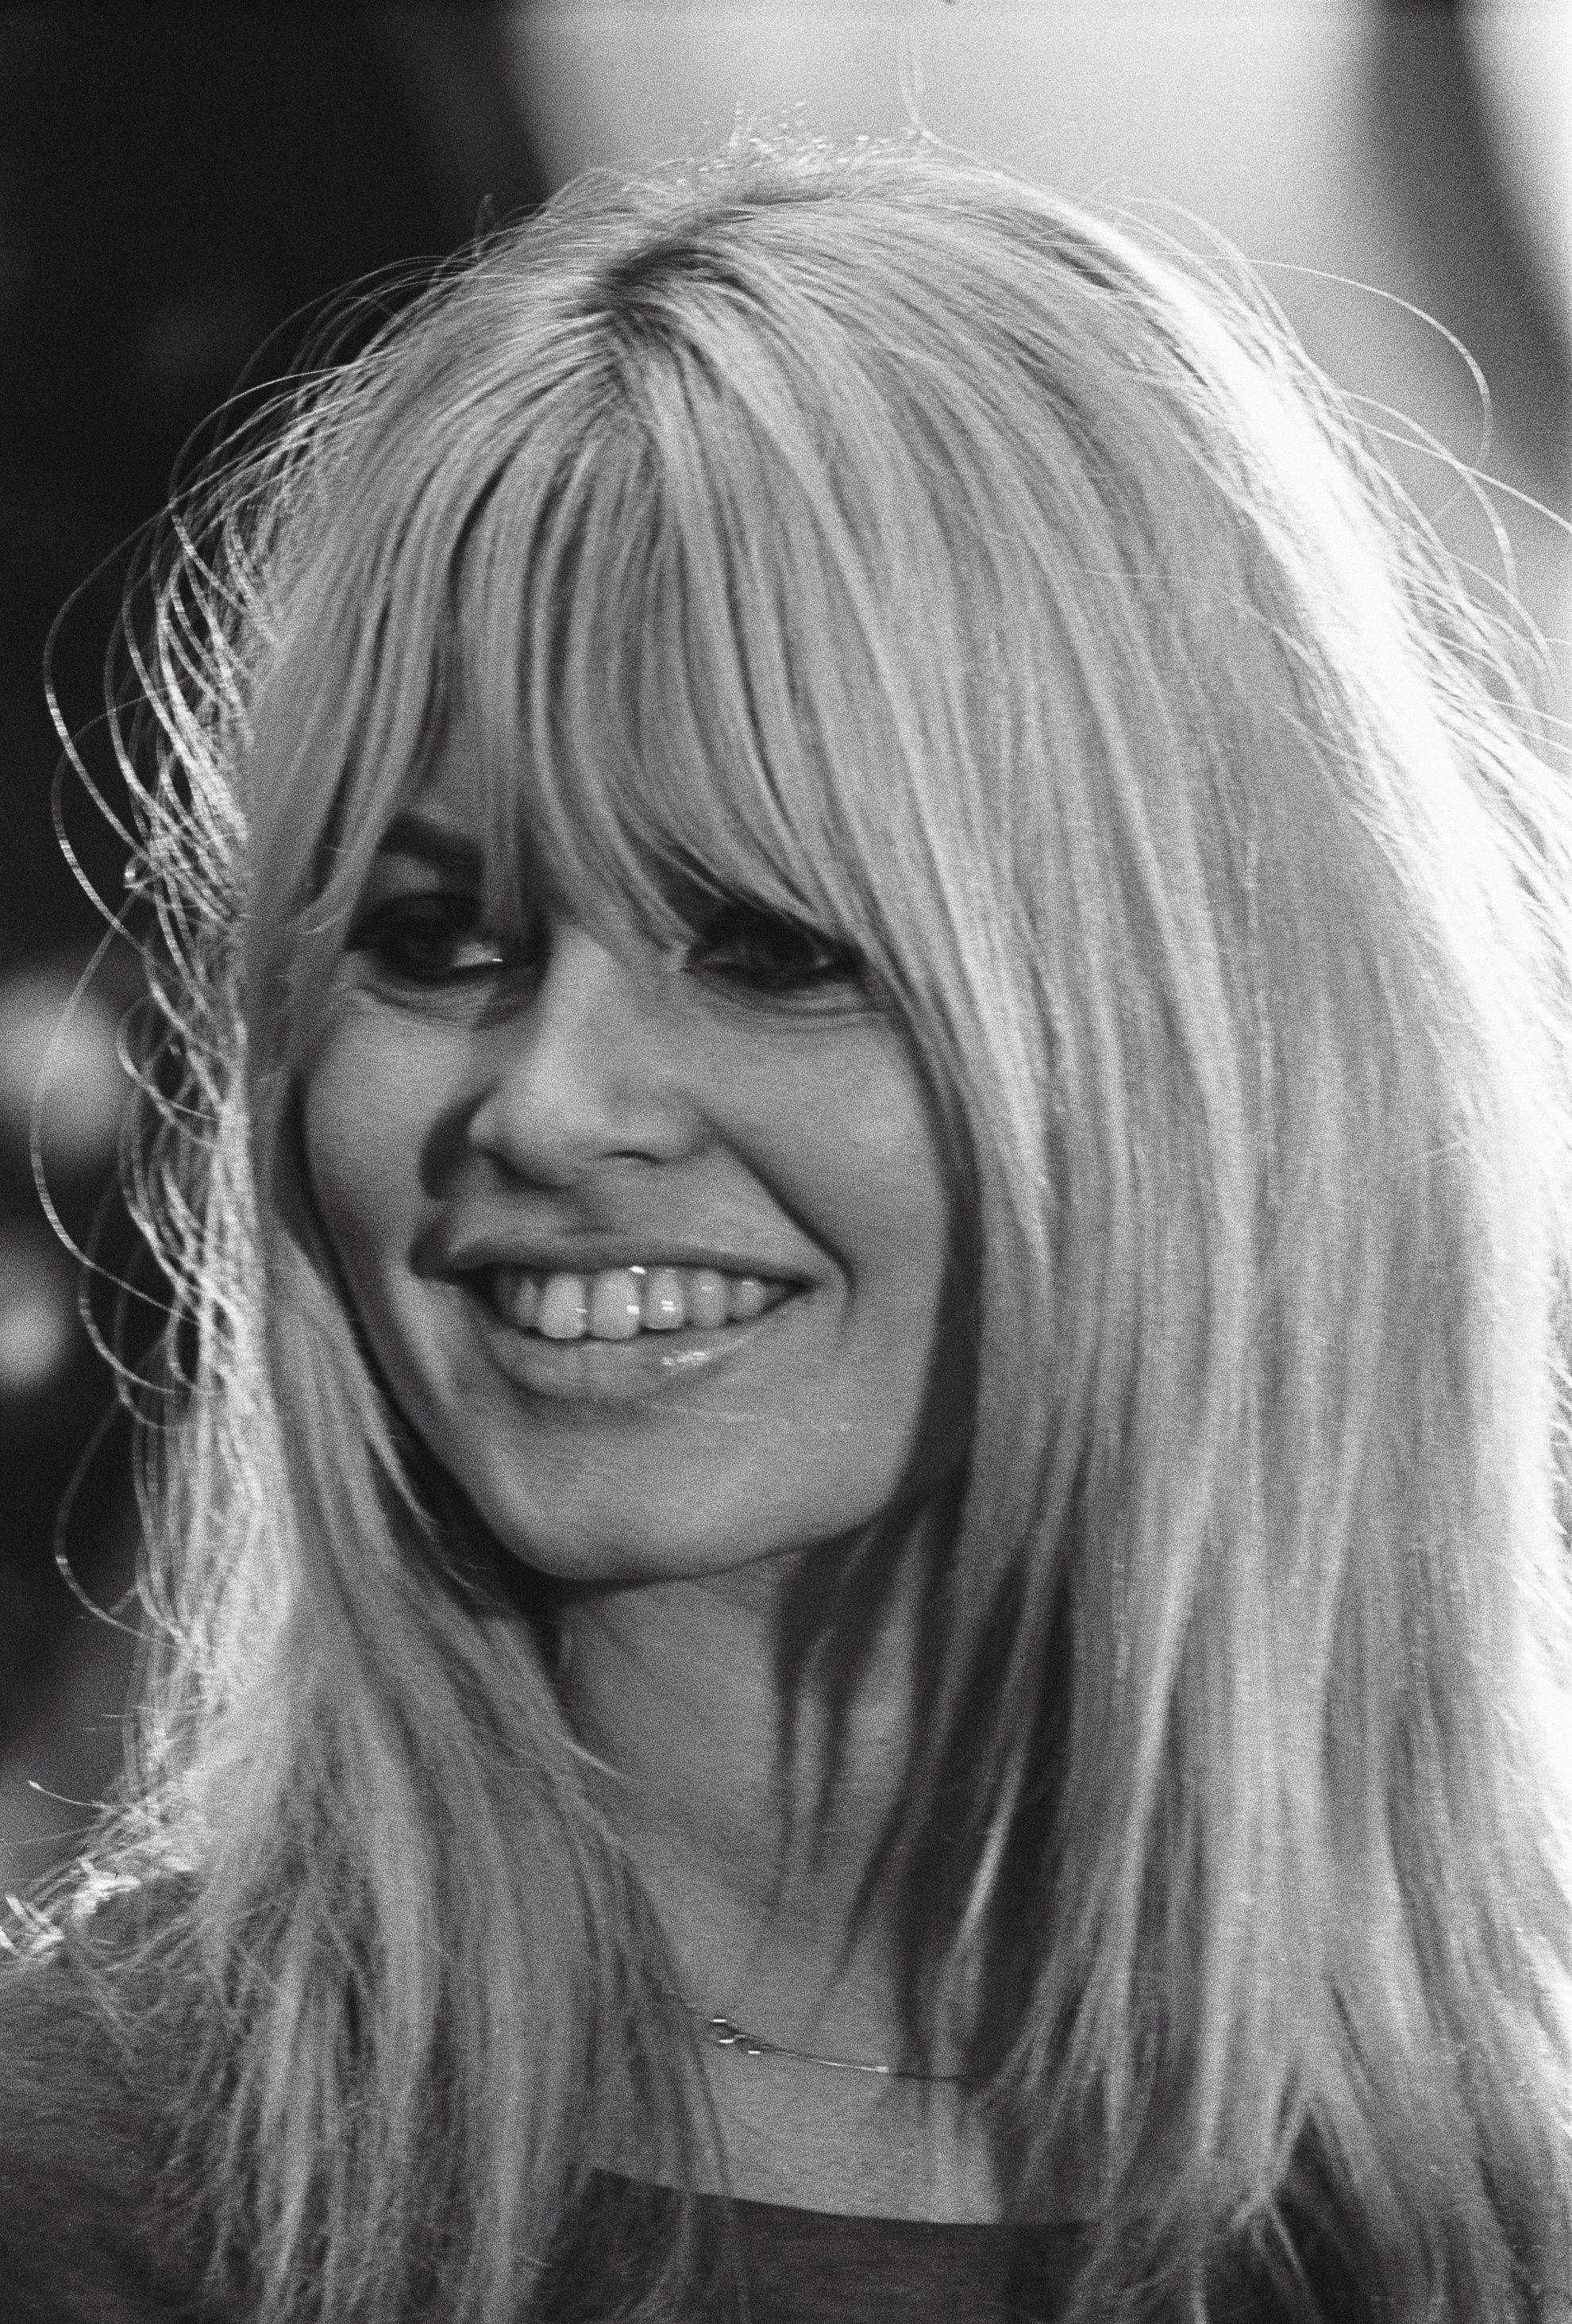 Brigitte bardot icons pinterest google images bardot and google